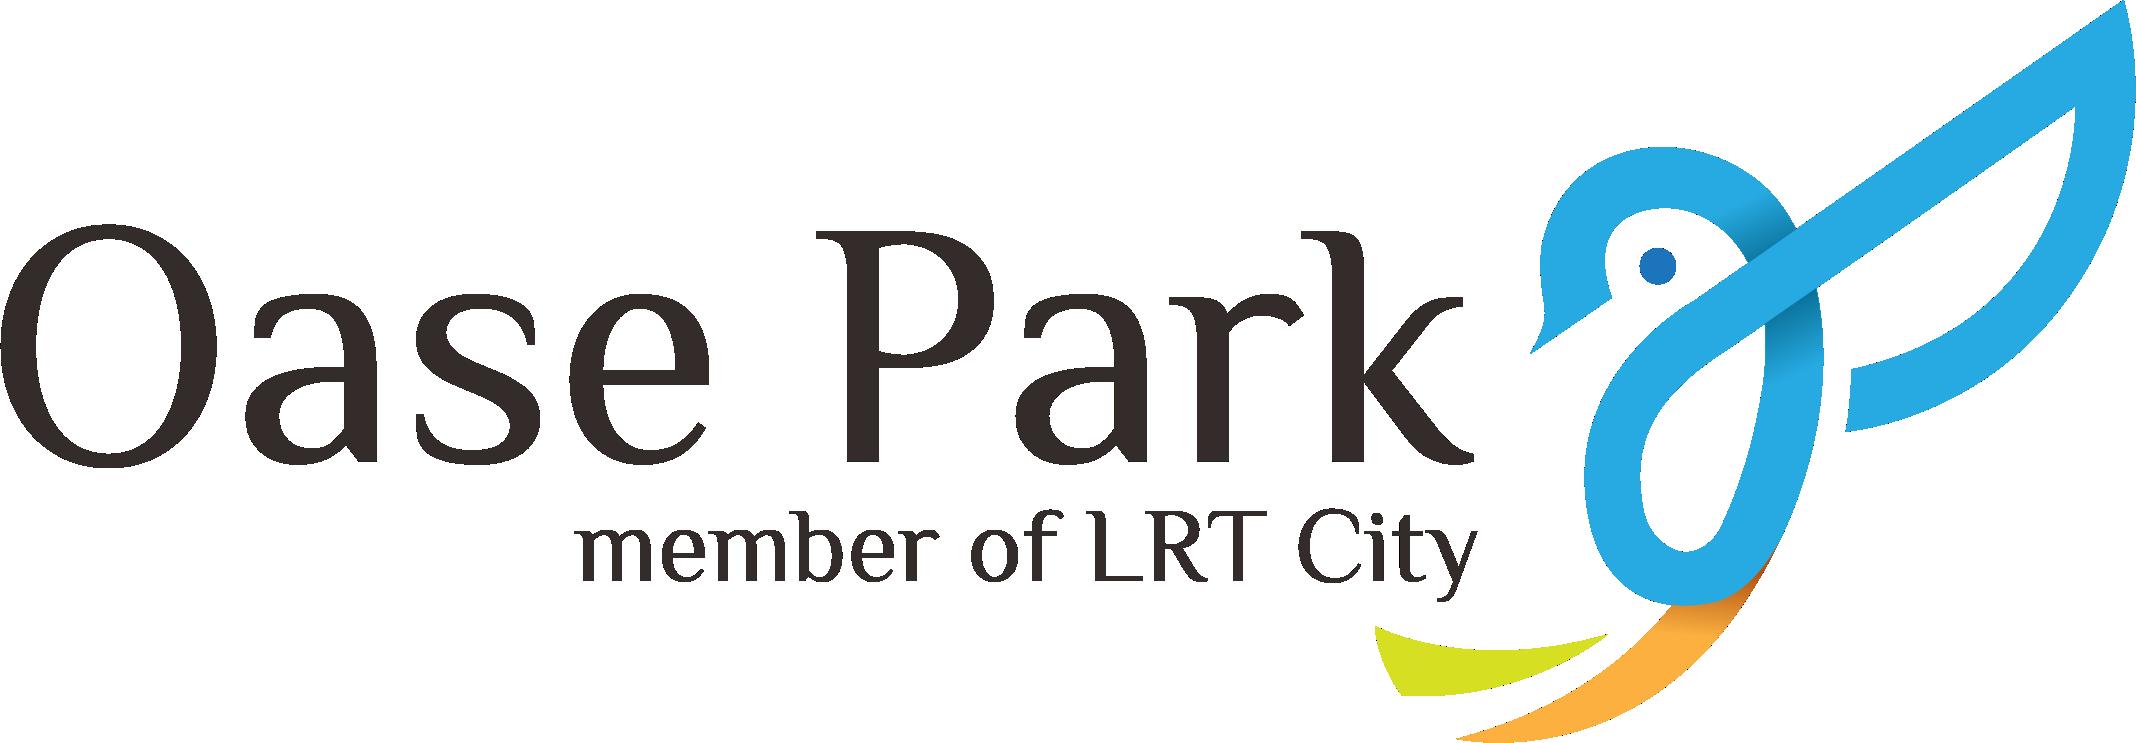 Oase Park Apartment - member of LRT City